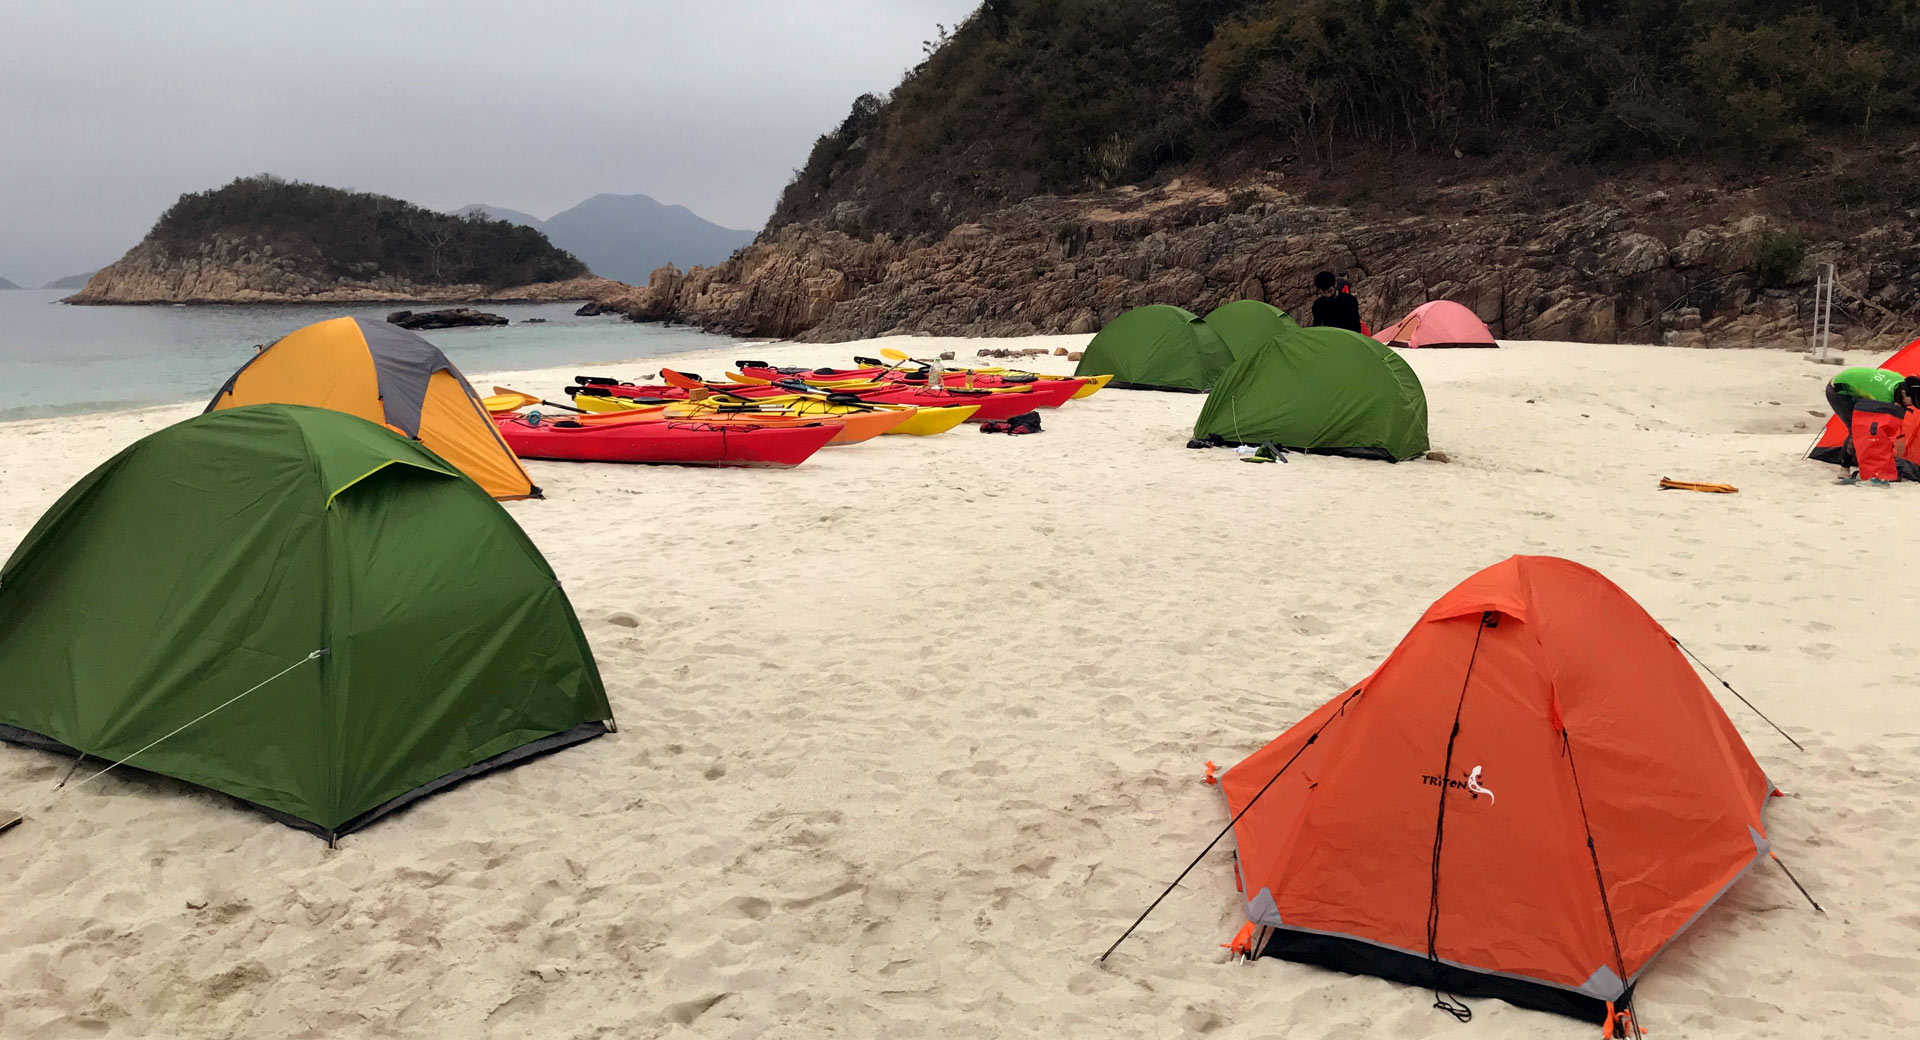 2 day sea camping trip